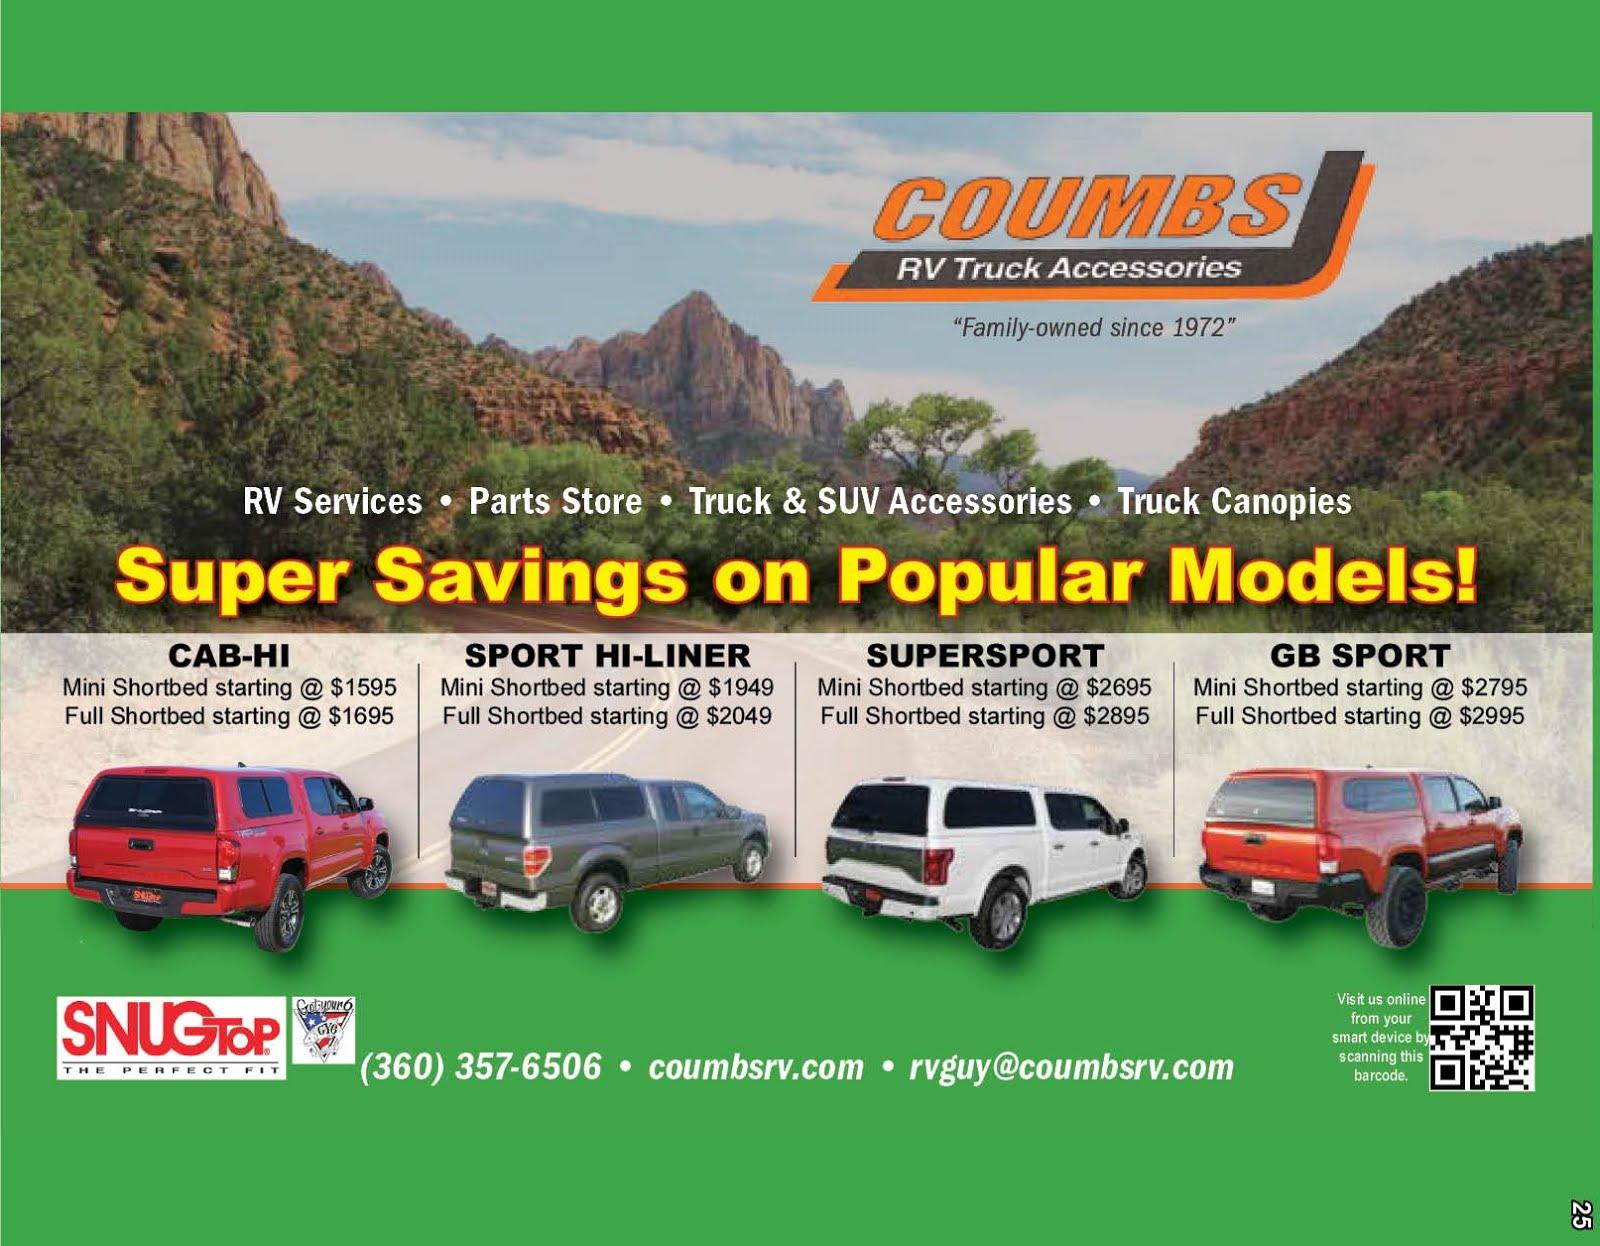 Coumbs RV Truck Accessories